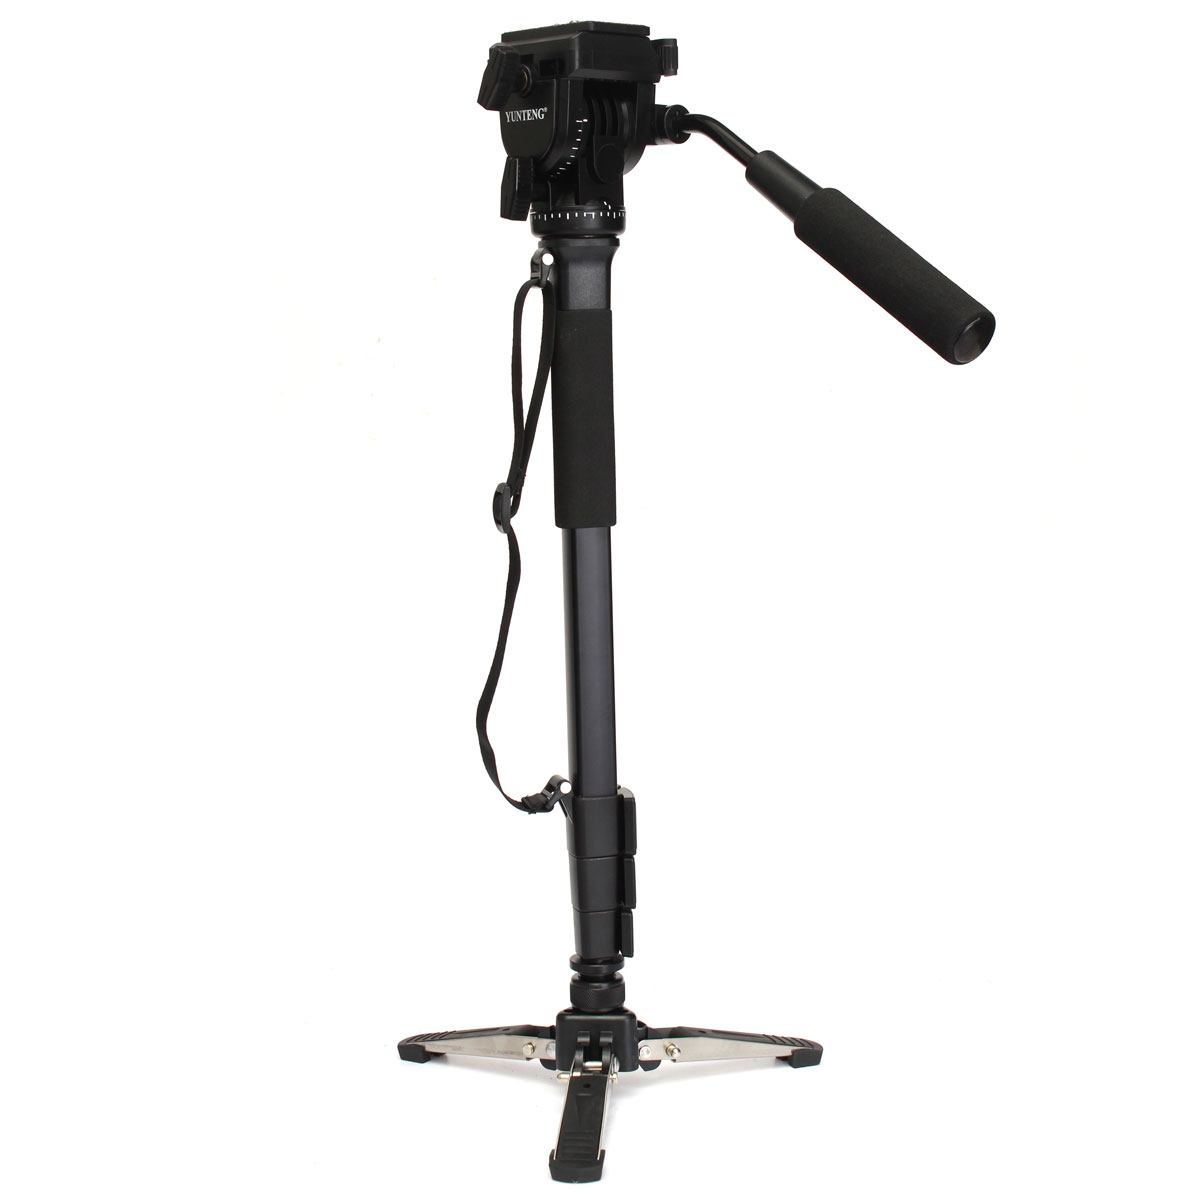 YUNTENG VCT-288 Camera Monopod+Fluid Pan Head+Unipod Holder Aluminum Alloy For DSLR Camera Loading Capacity 3kg 148cm Black